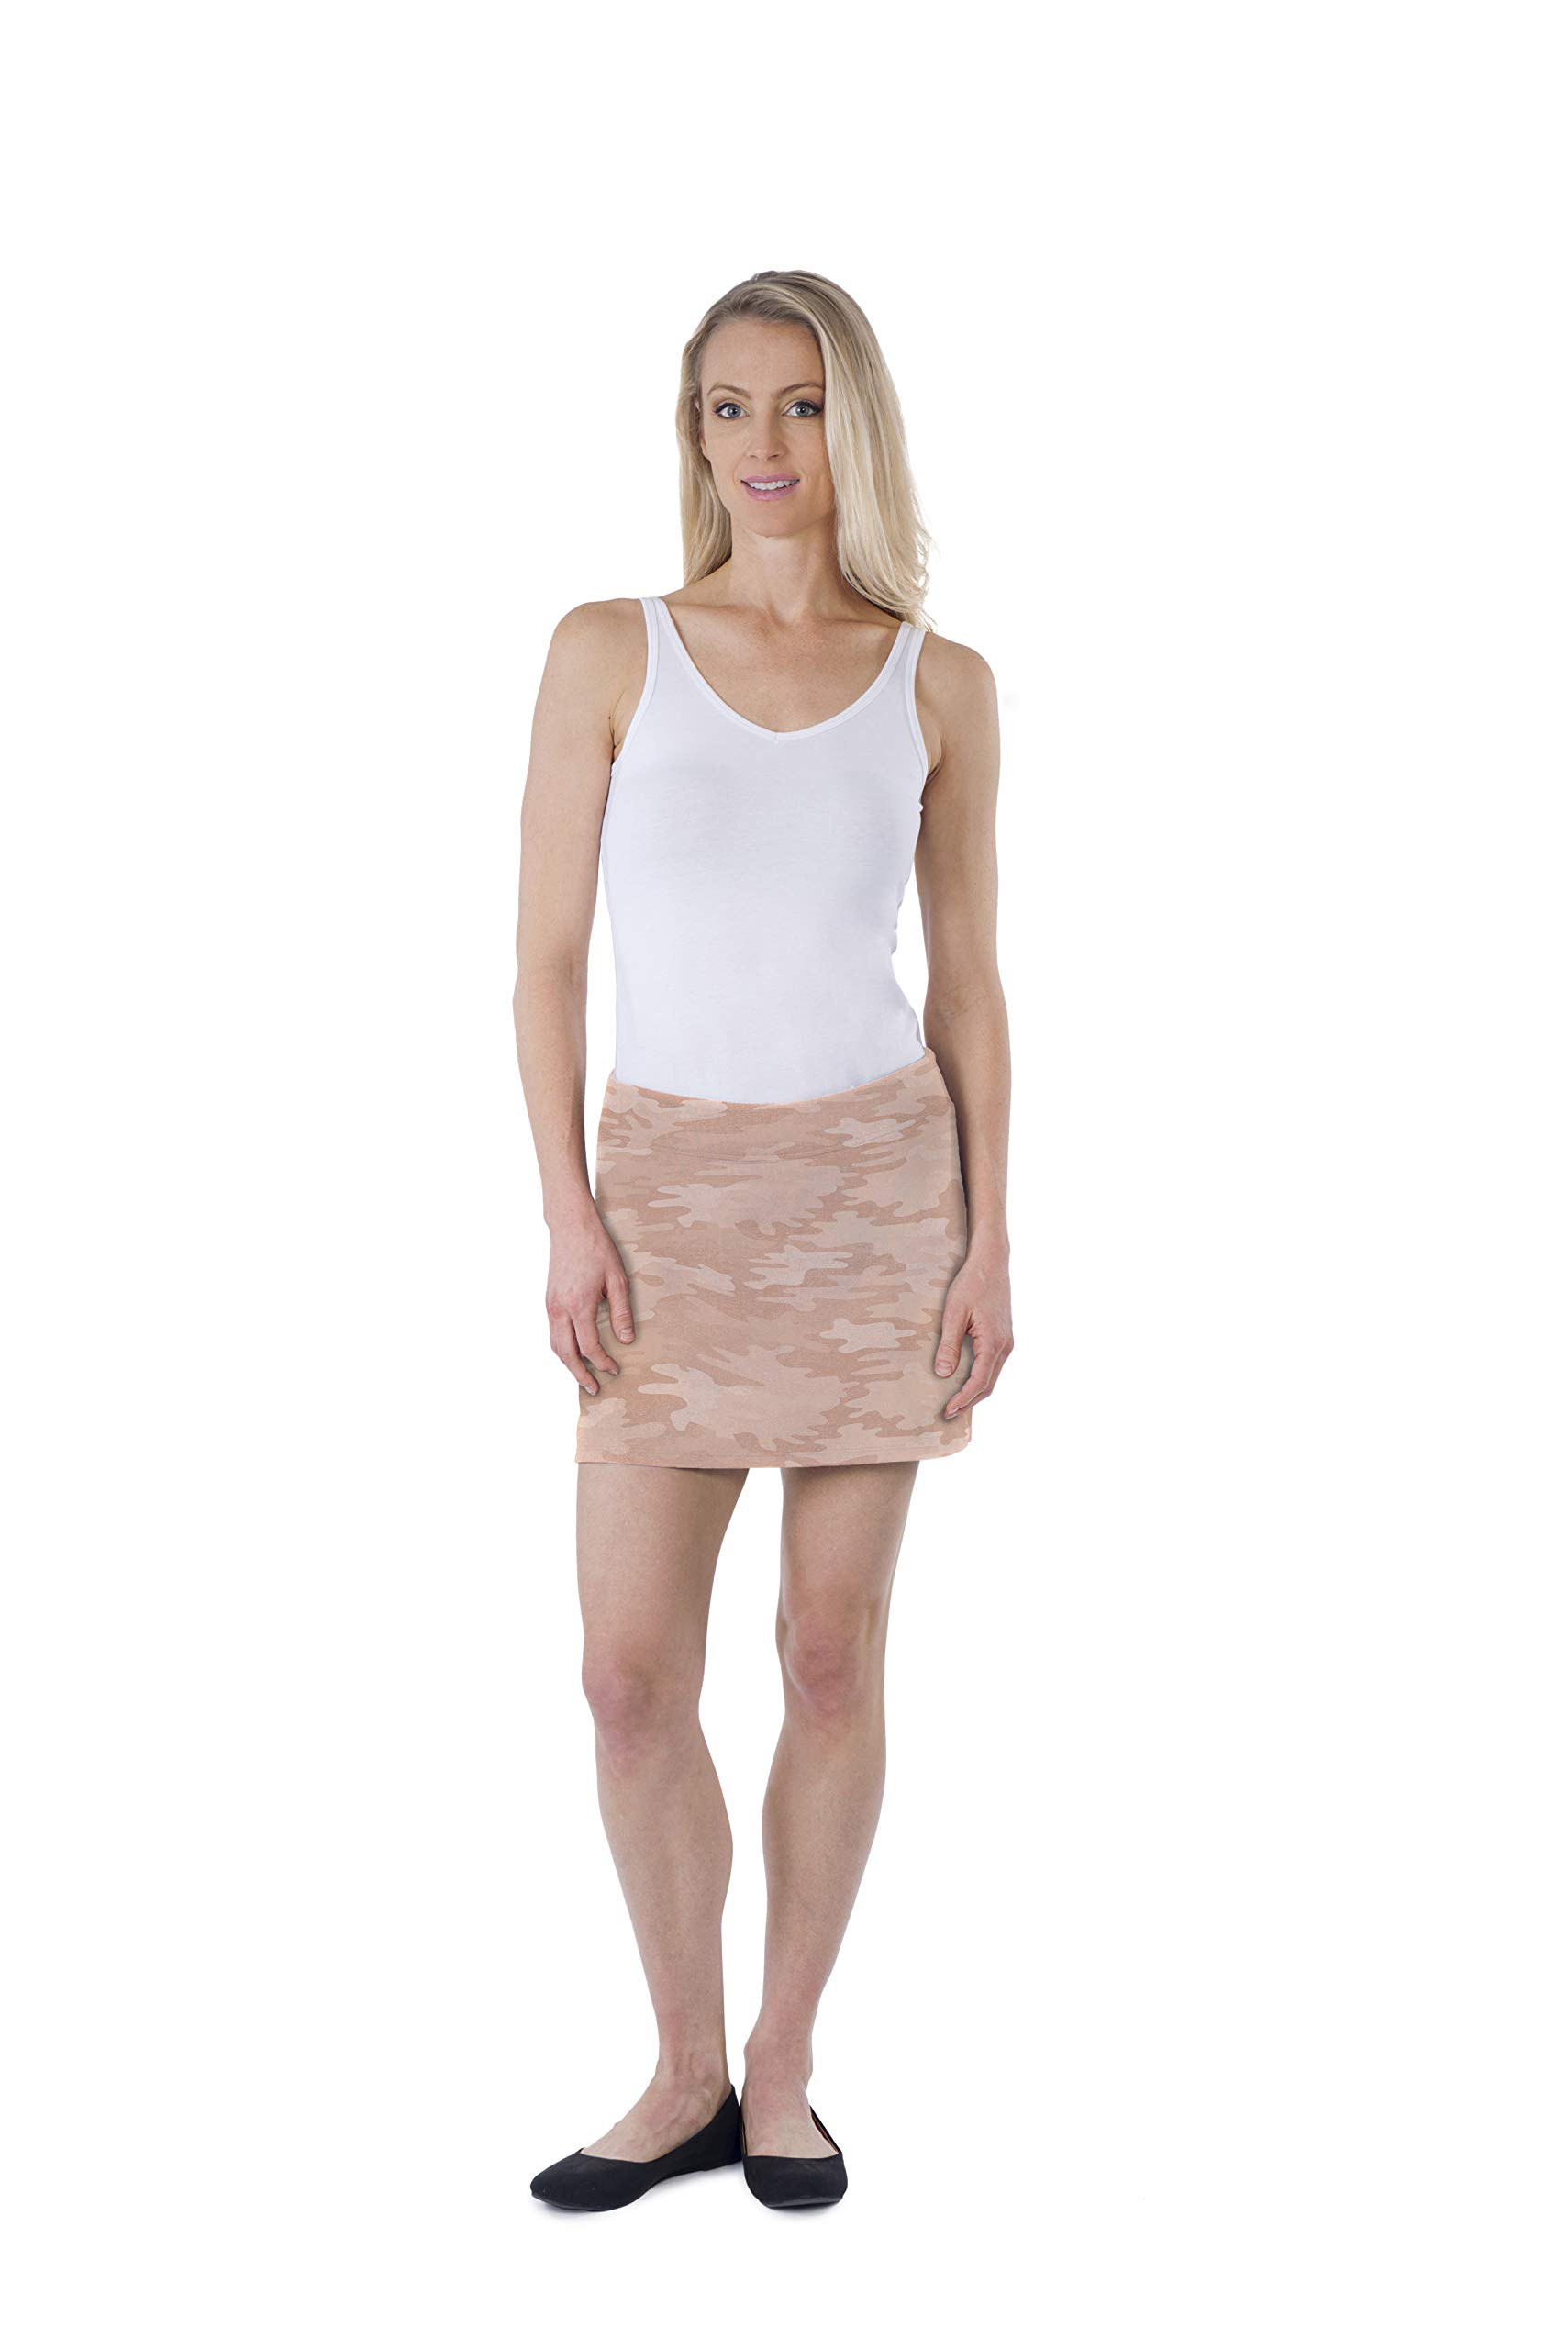 Colorado Clothing Women's Everyday Skort (Camo Rose Gold, S) by Colorado Clothing